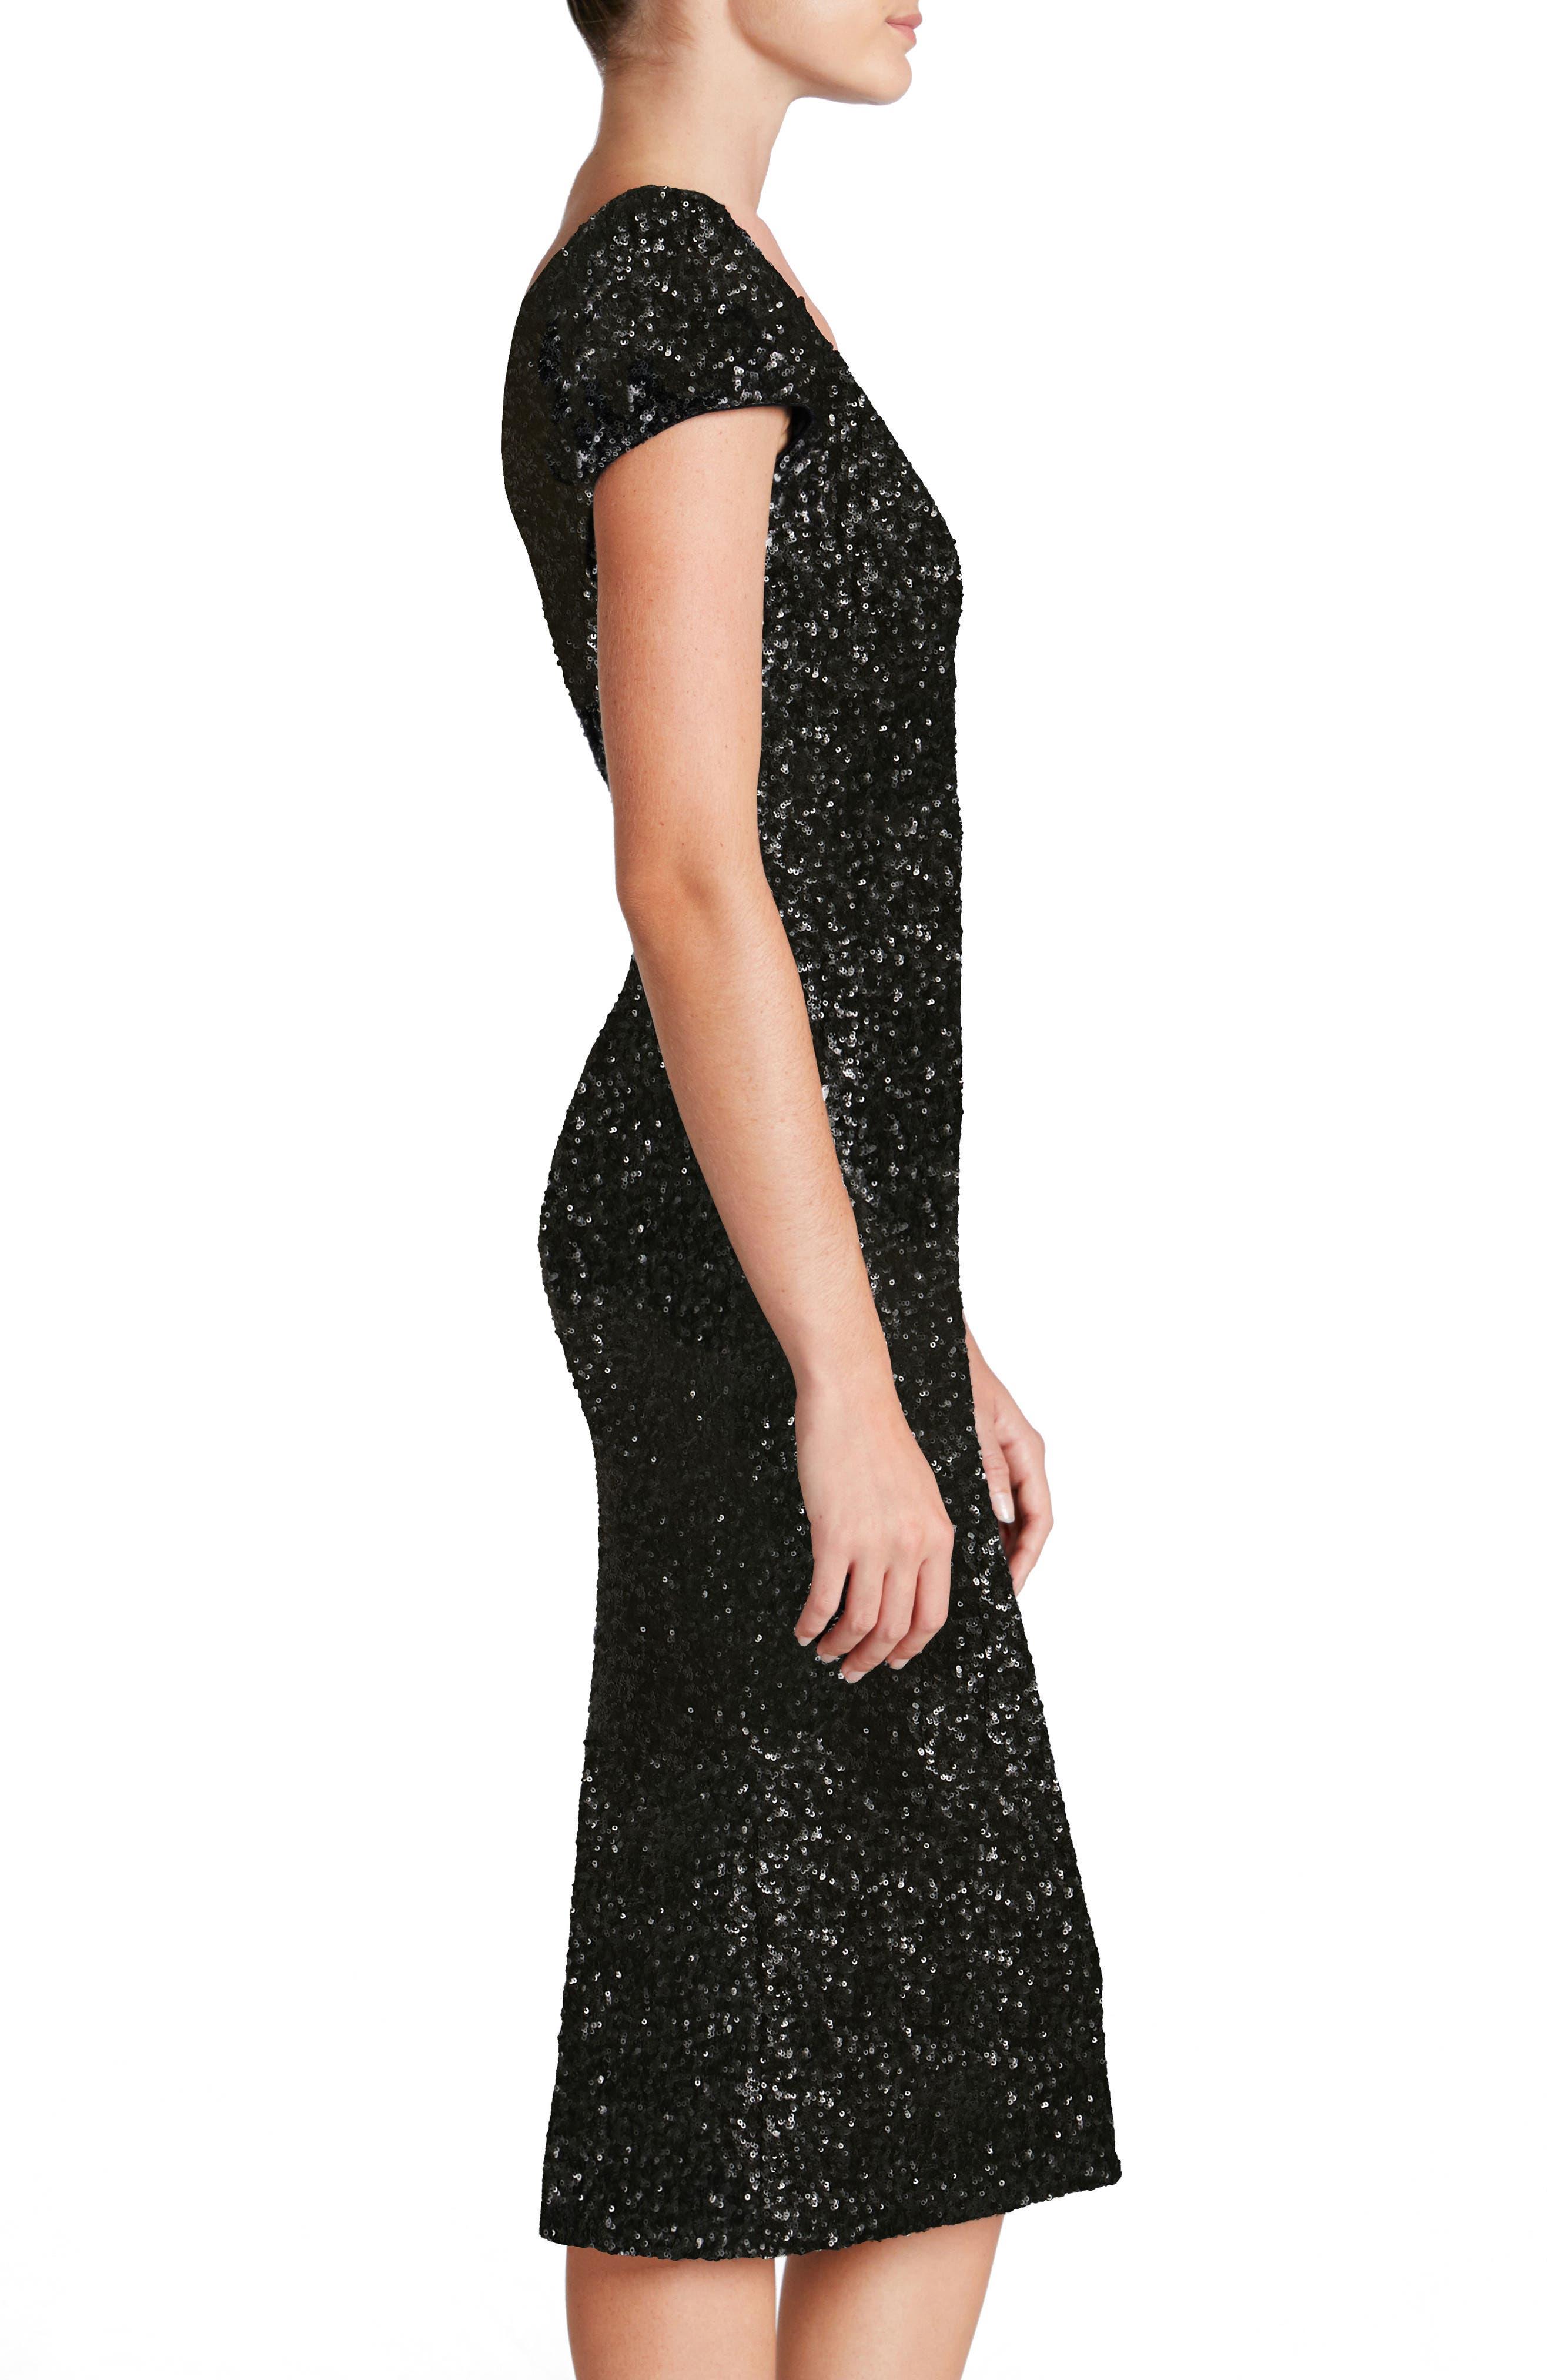 DRESS THE POPULATION,                             Allison Sequin Sheath Dress,                             Alternate thumbnail 4, color,                             008